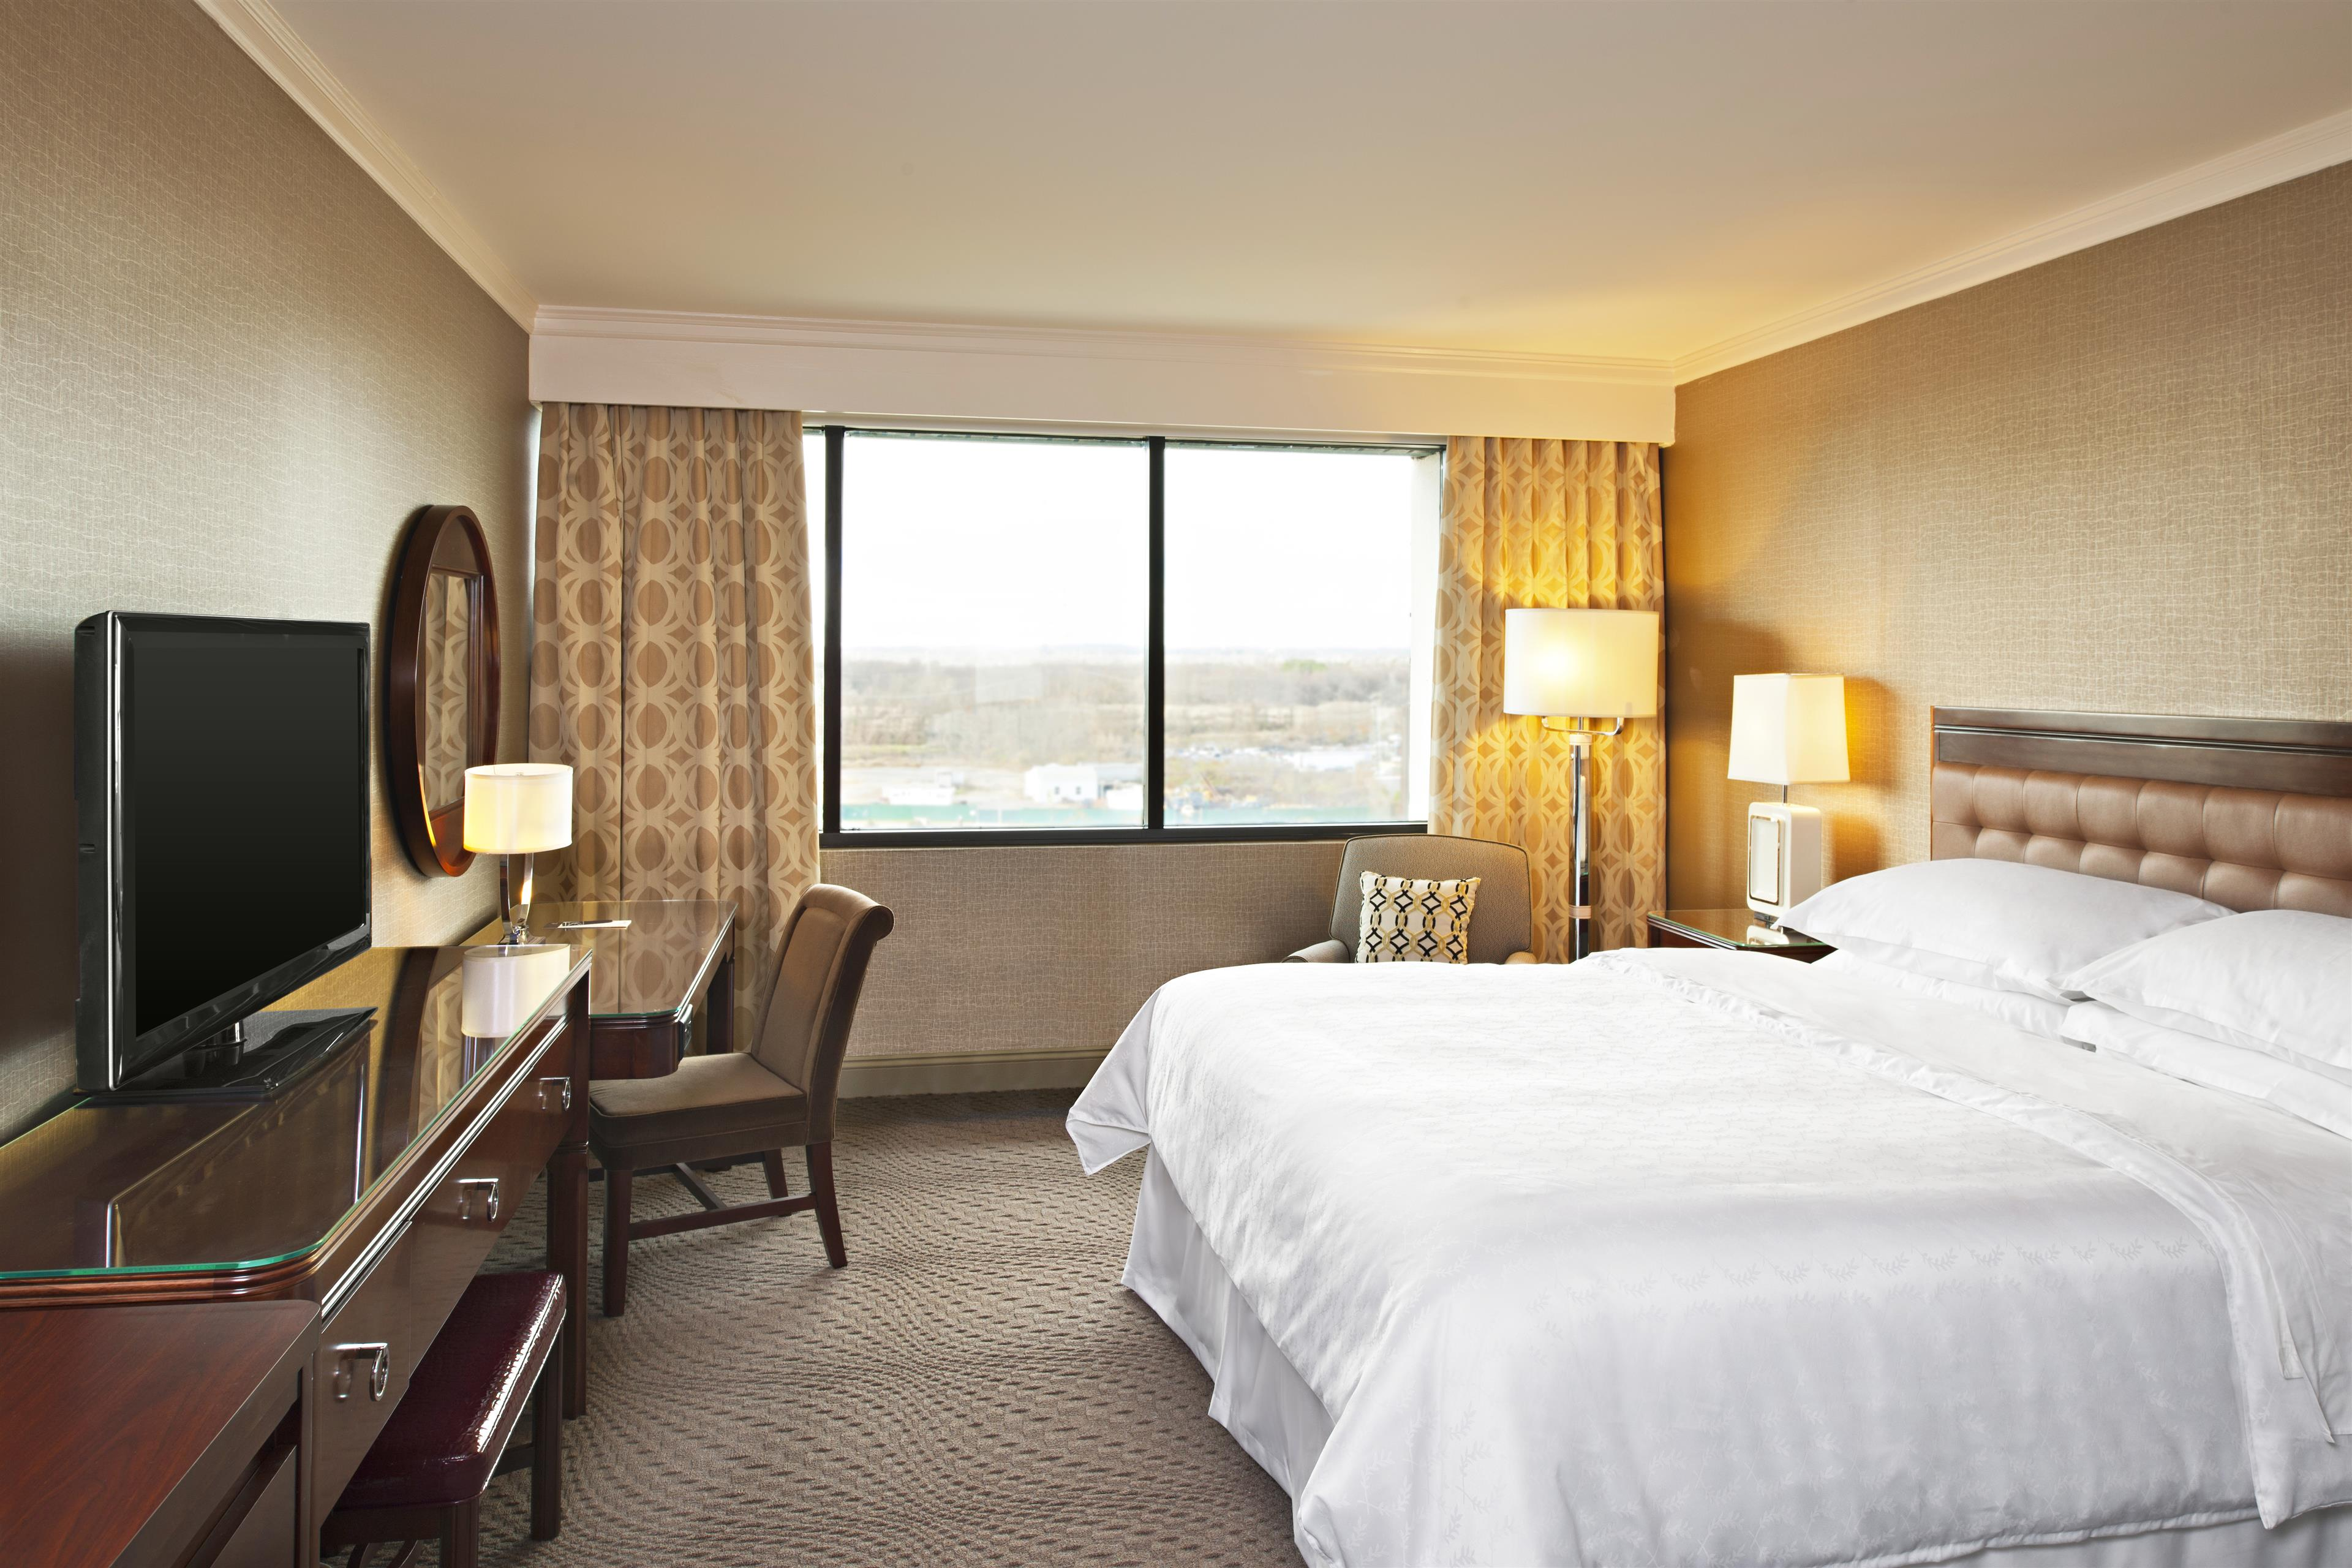 Sheraton Wilmington South Hotel image 16